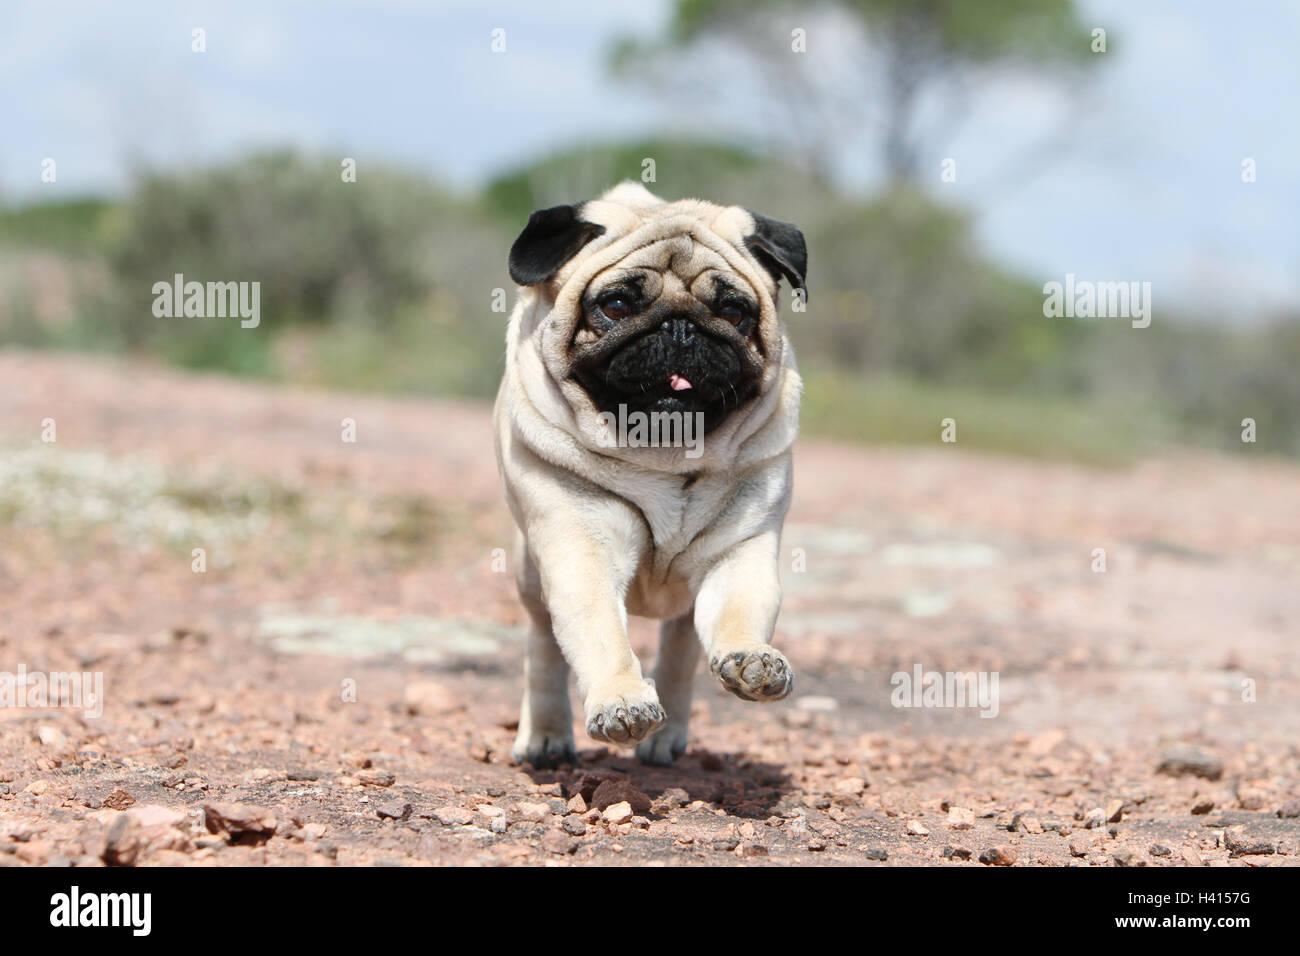 Hund Mops / Carlin / Mops Erwachsenen Reh grau grau stehende Felsen ...